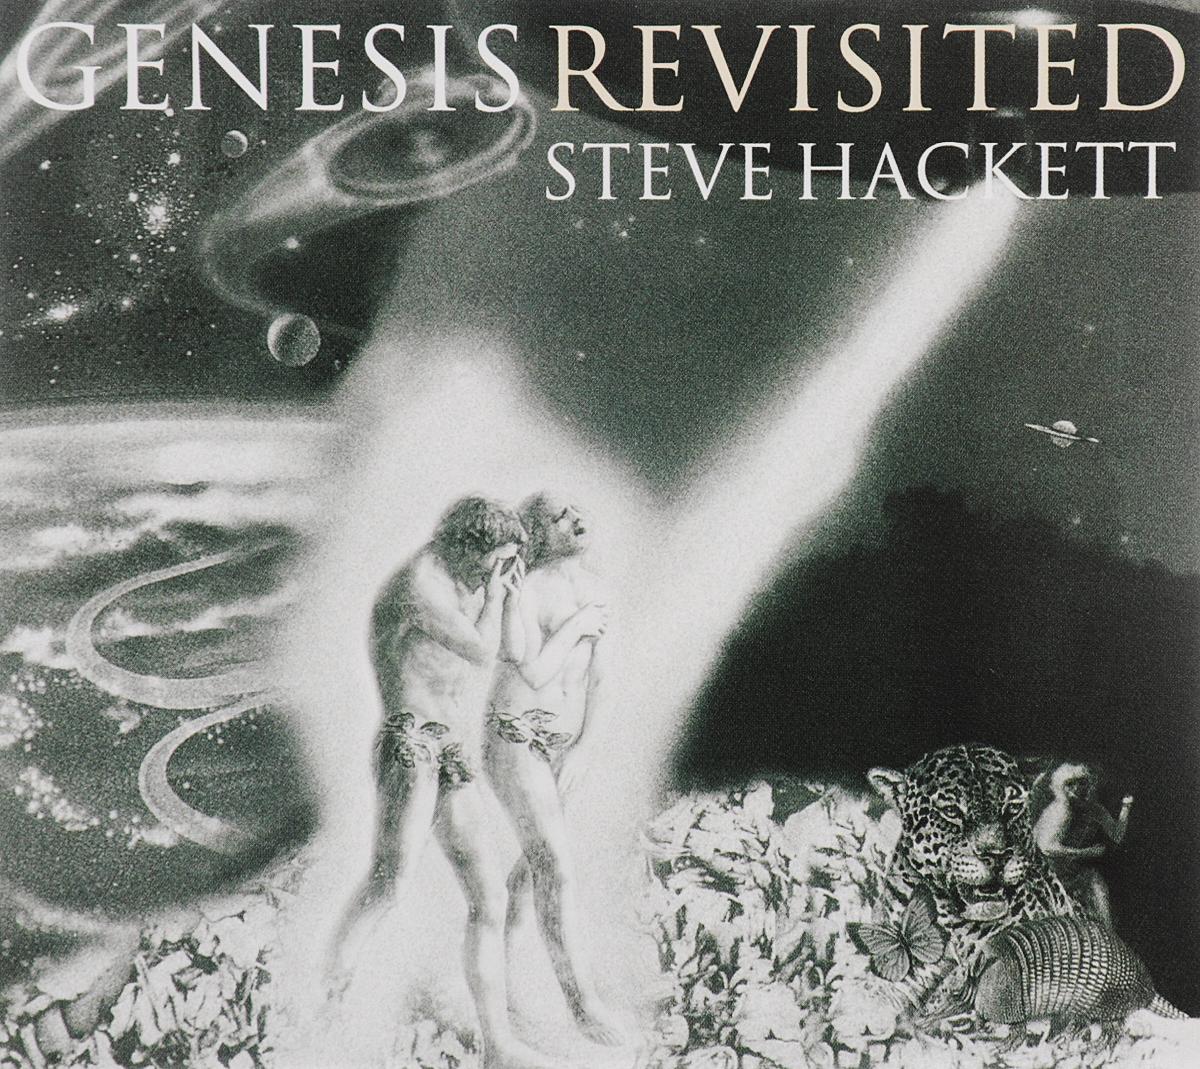 Стив Хэкетт Steve Hackett. Genesis Revisited стив хэкетт steve hackett genesis revisited live at hammersmith 3 cd 2 dvd